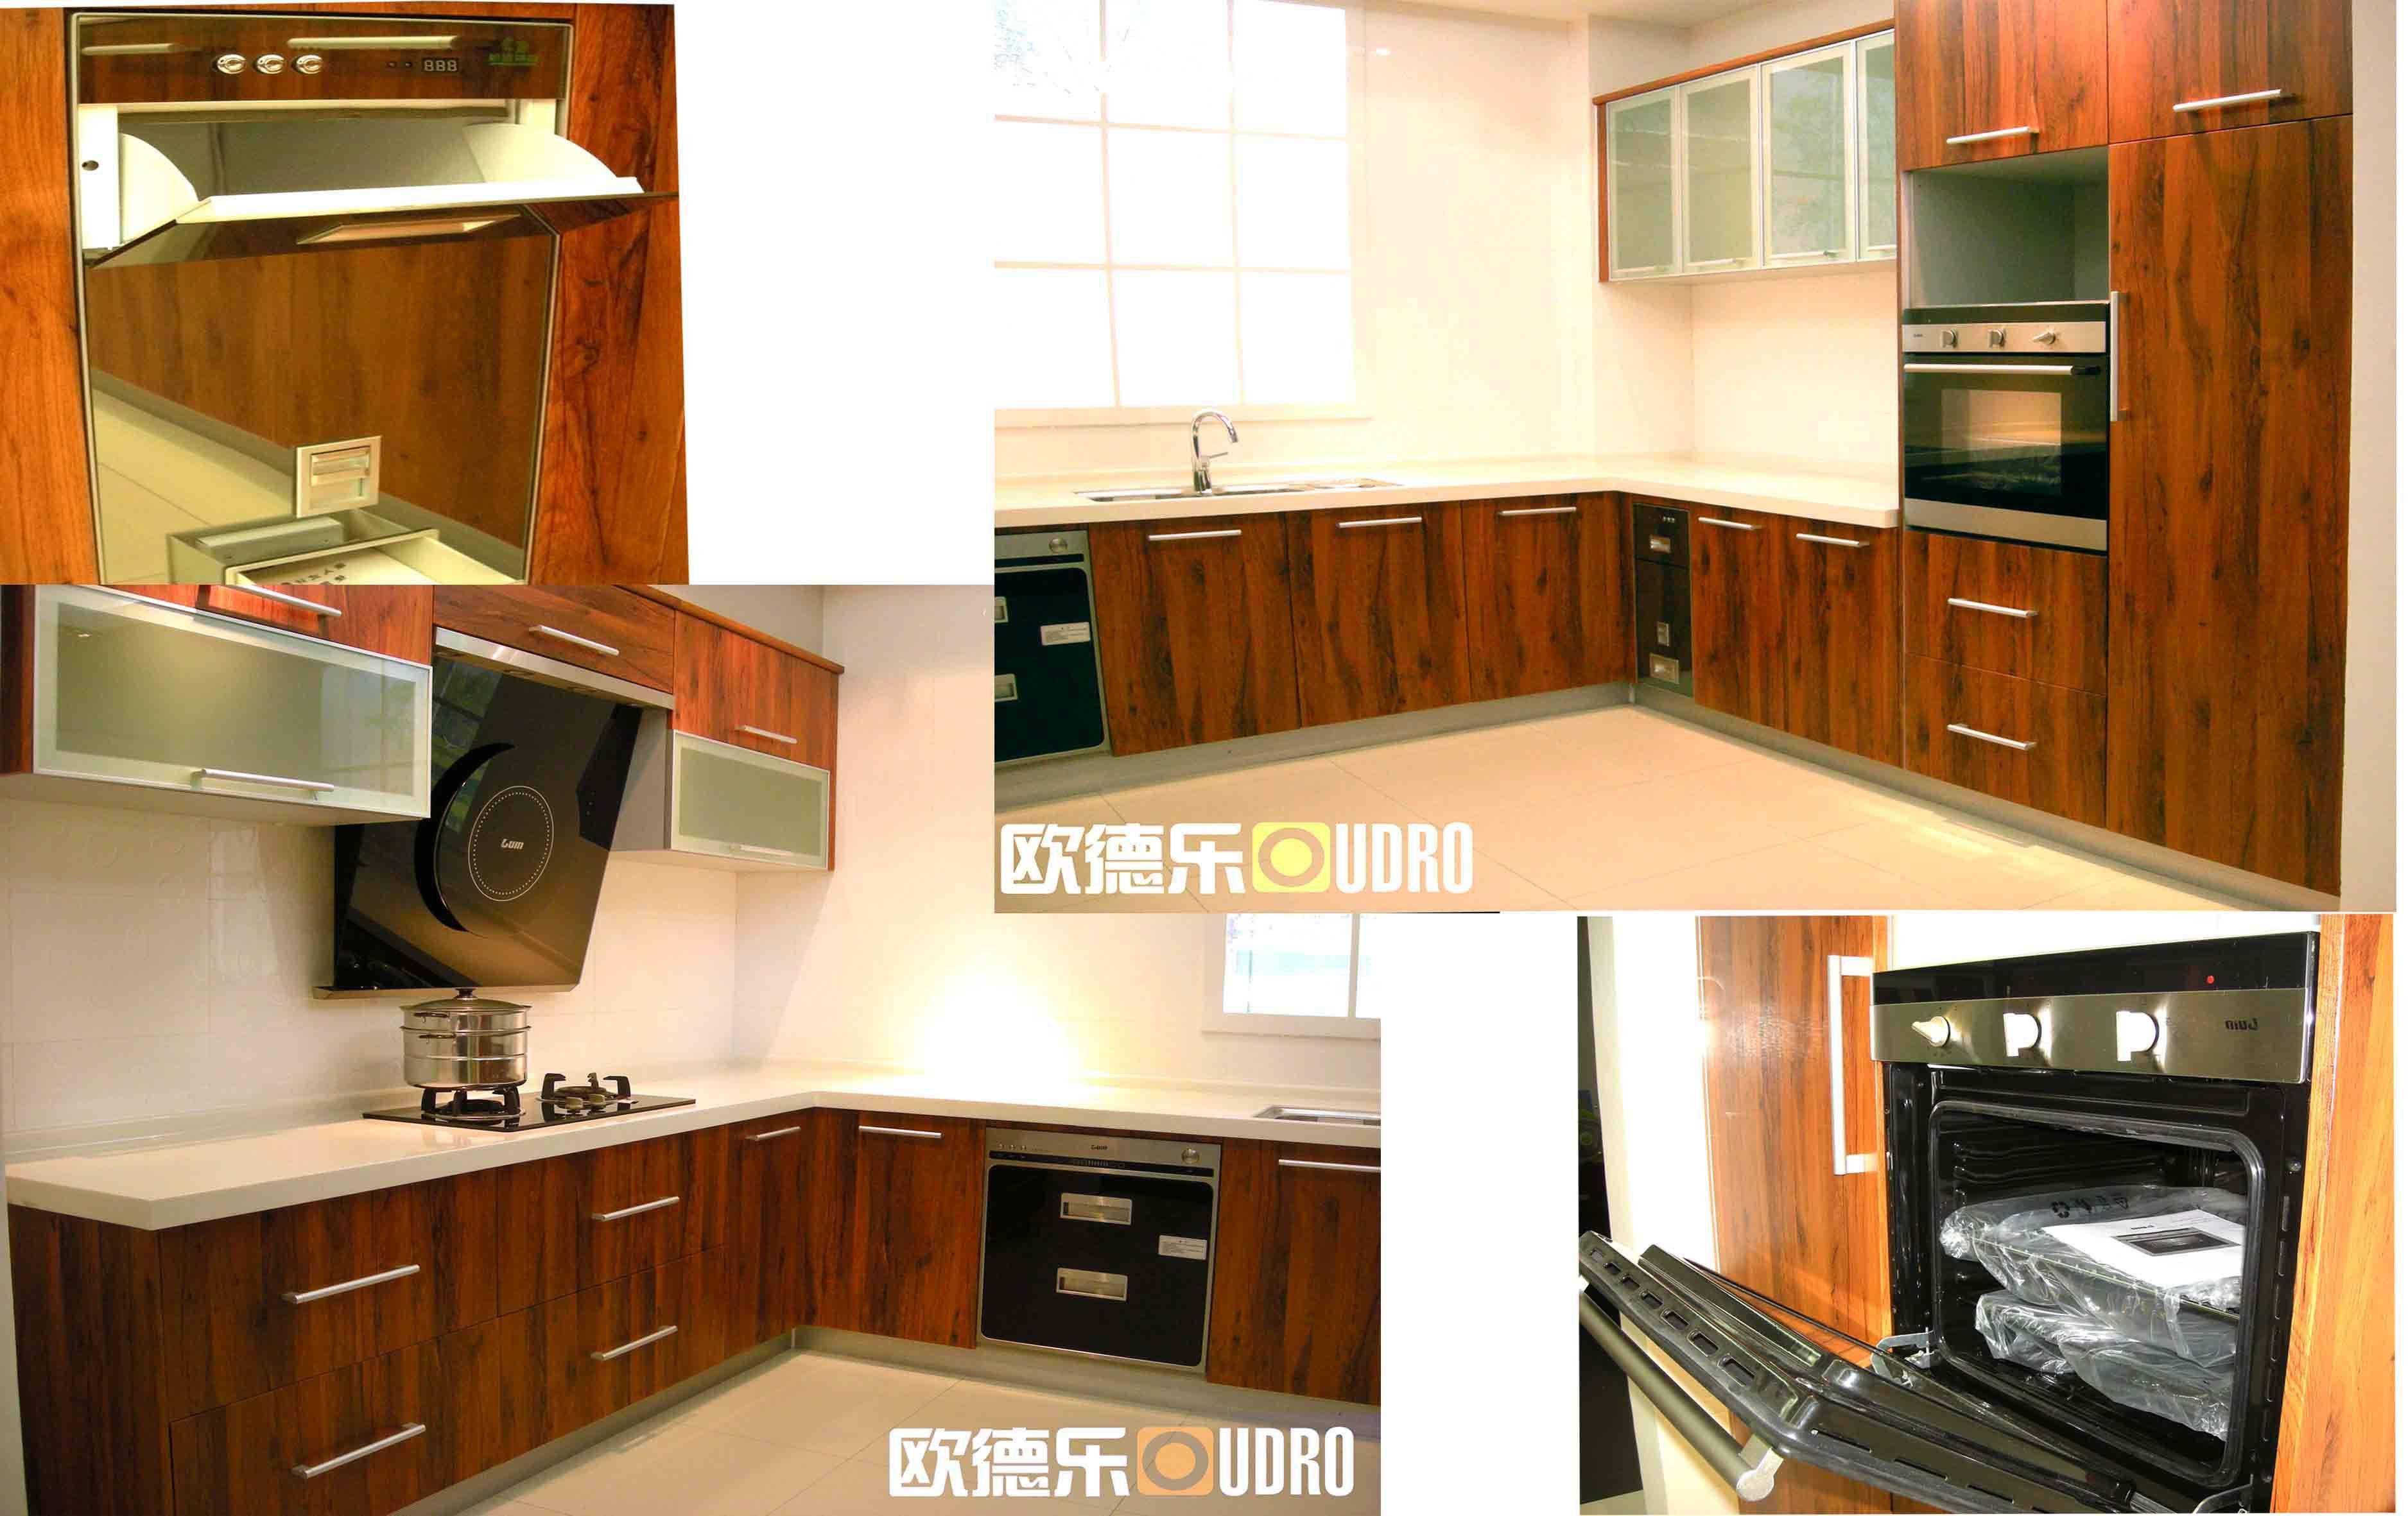 gabinete de cocina del panel de la puerta del pvc odr